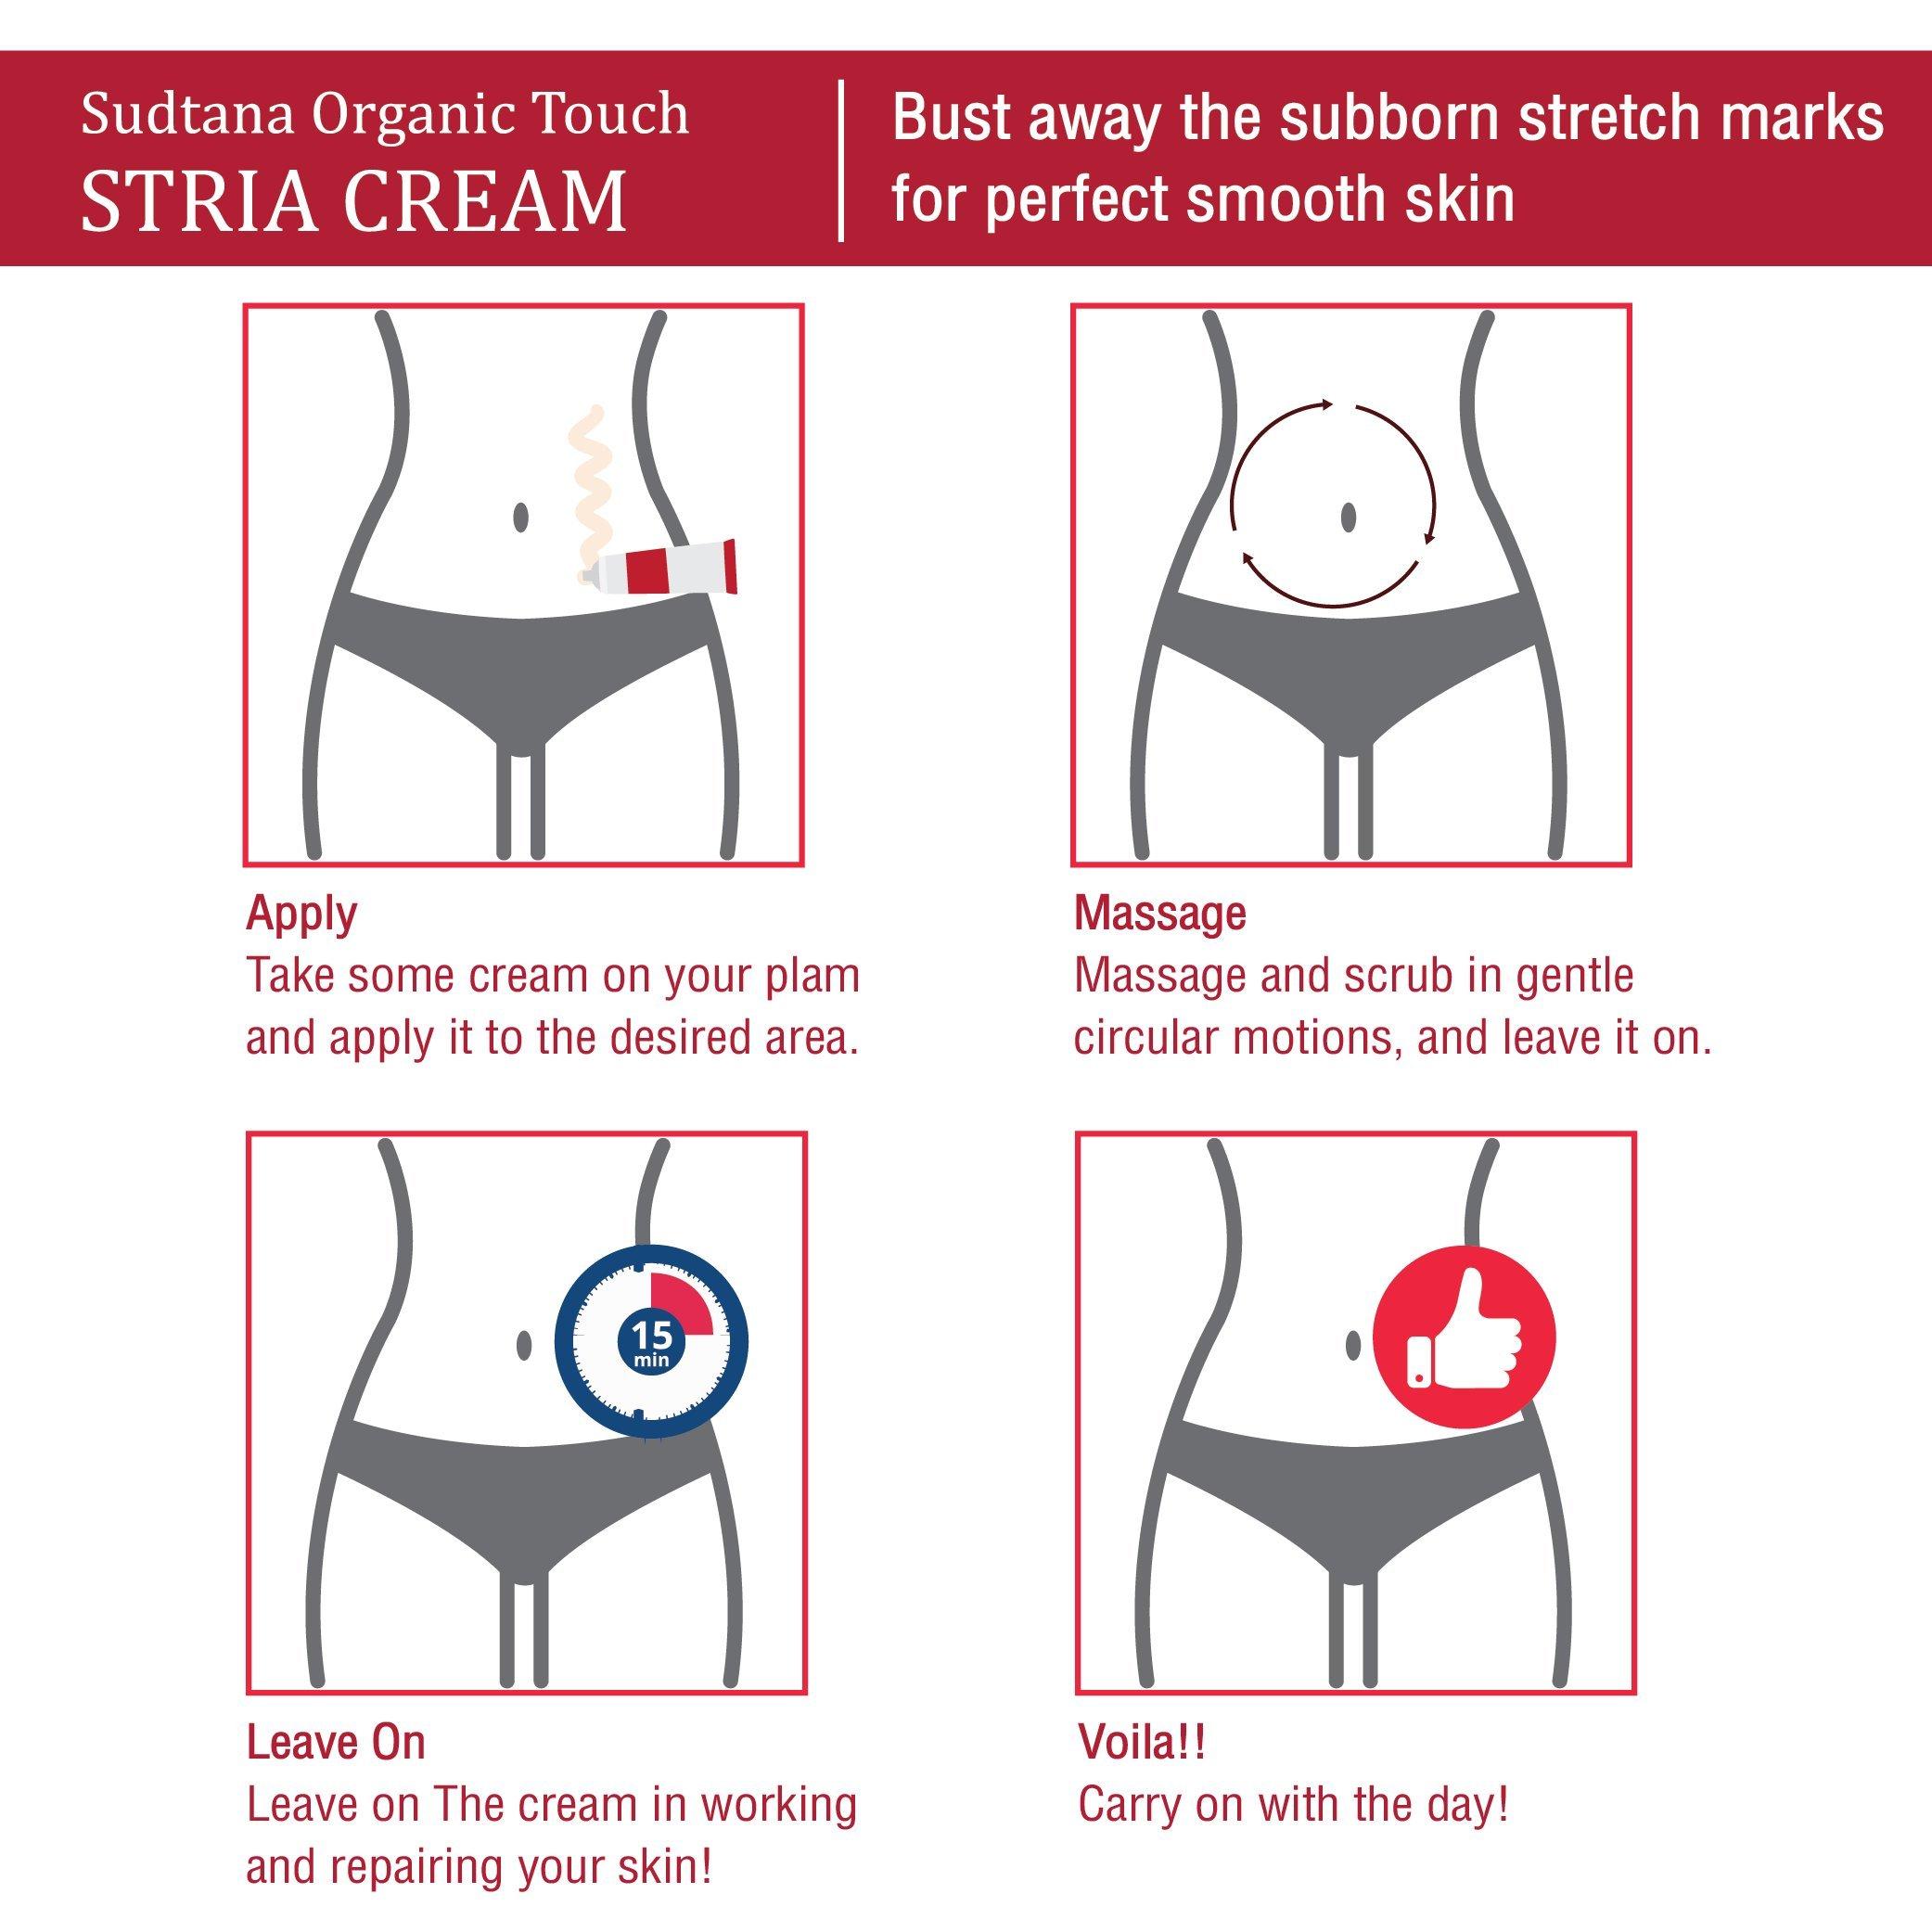 STRIA Natural Stretch Marks, Scar & Dark Spot Remover   Stretch Mark Cream for Skin Hydration, Exfoliation, Tightening & Collagen Boost   Pregnancy Belly Care for Prenatal-Postnatal & Pregnant   3 pcs by GreenTouch (Image #9)